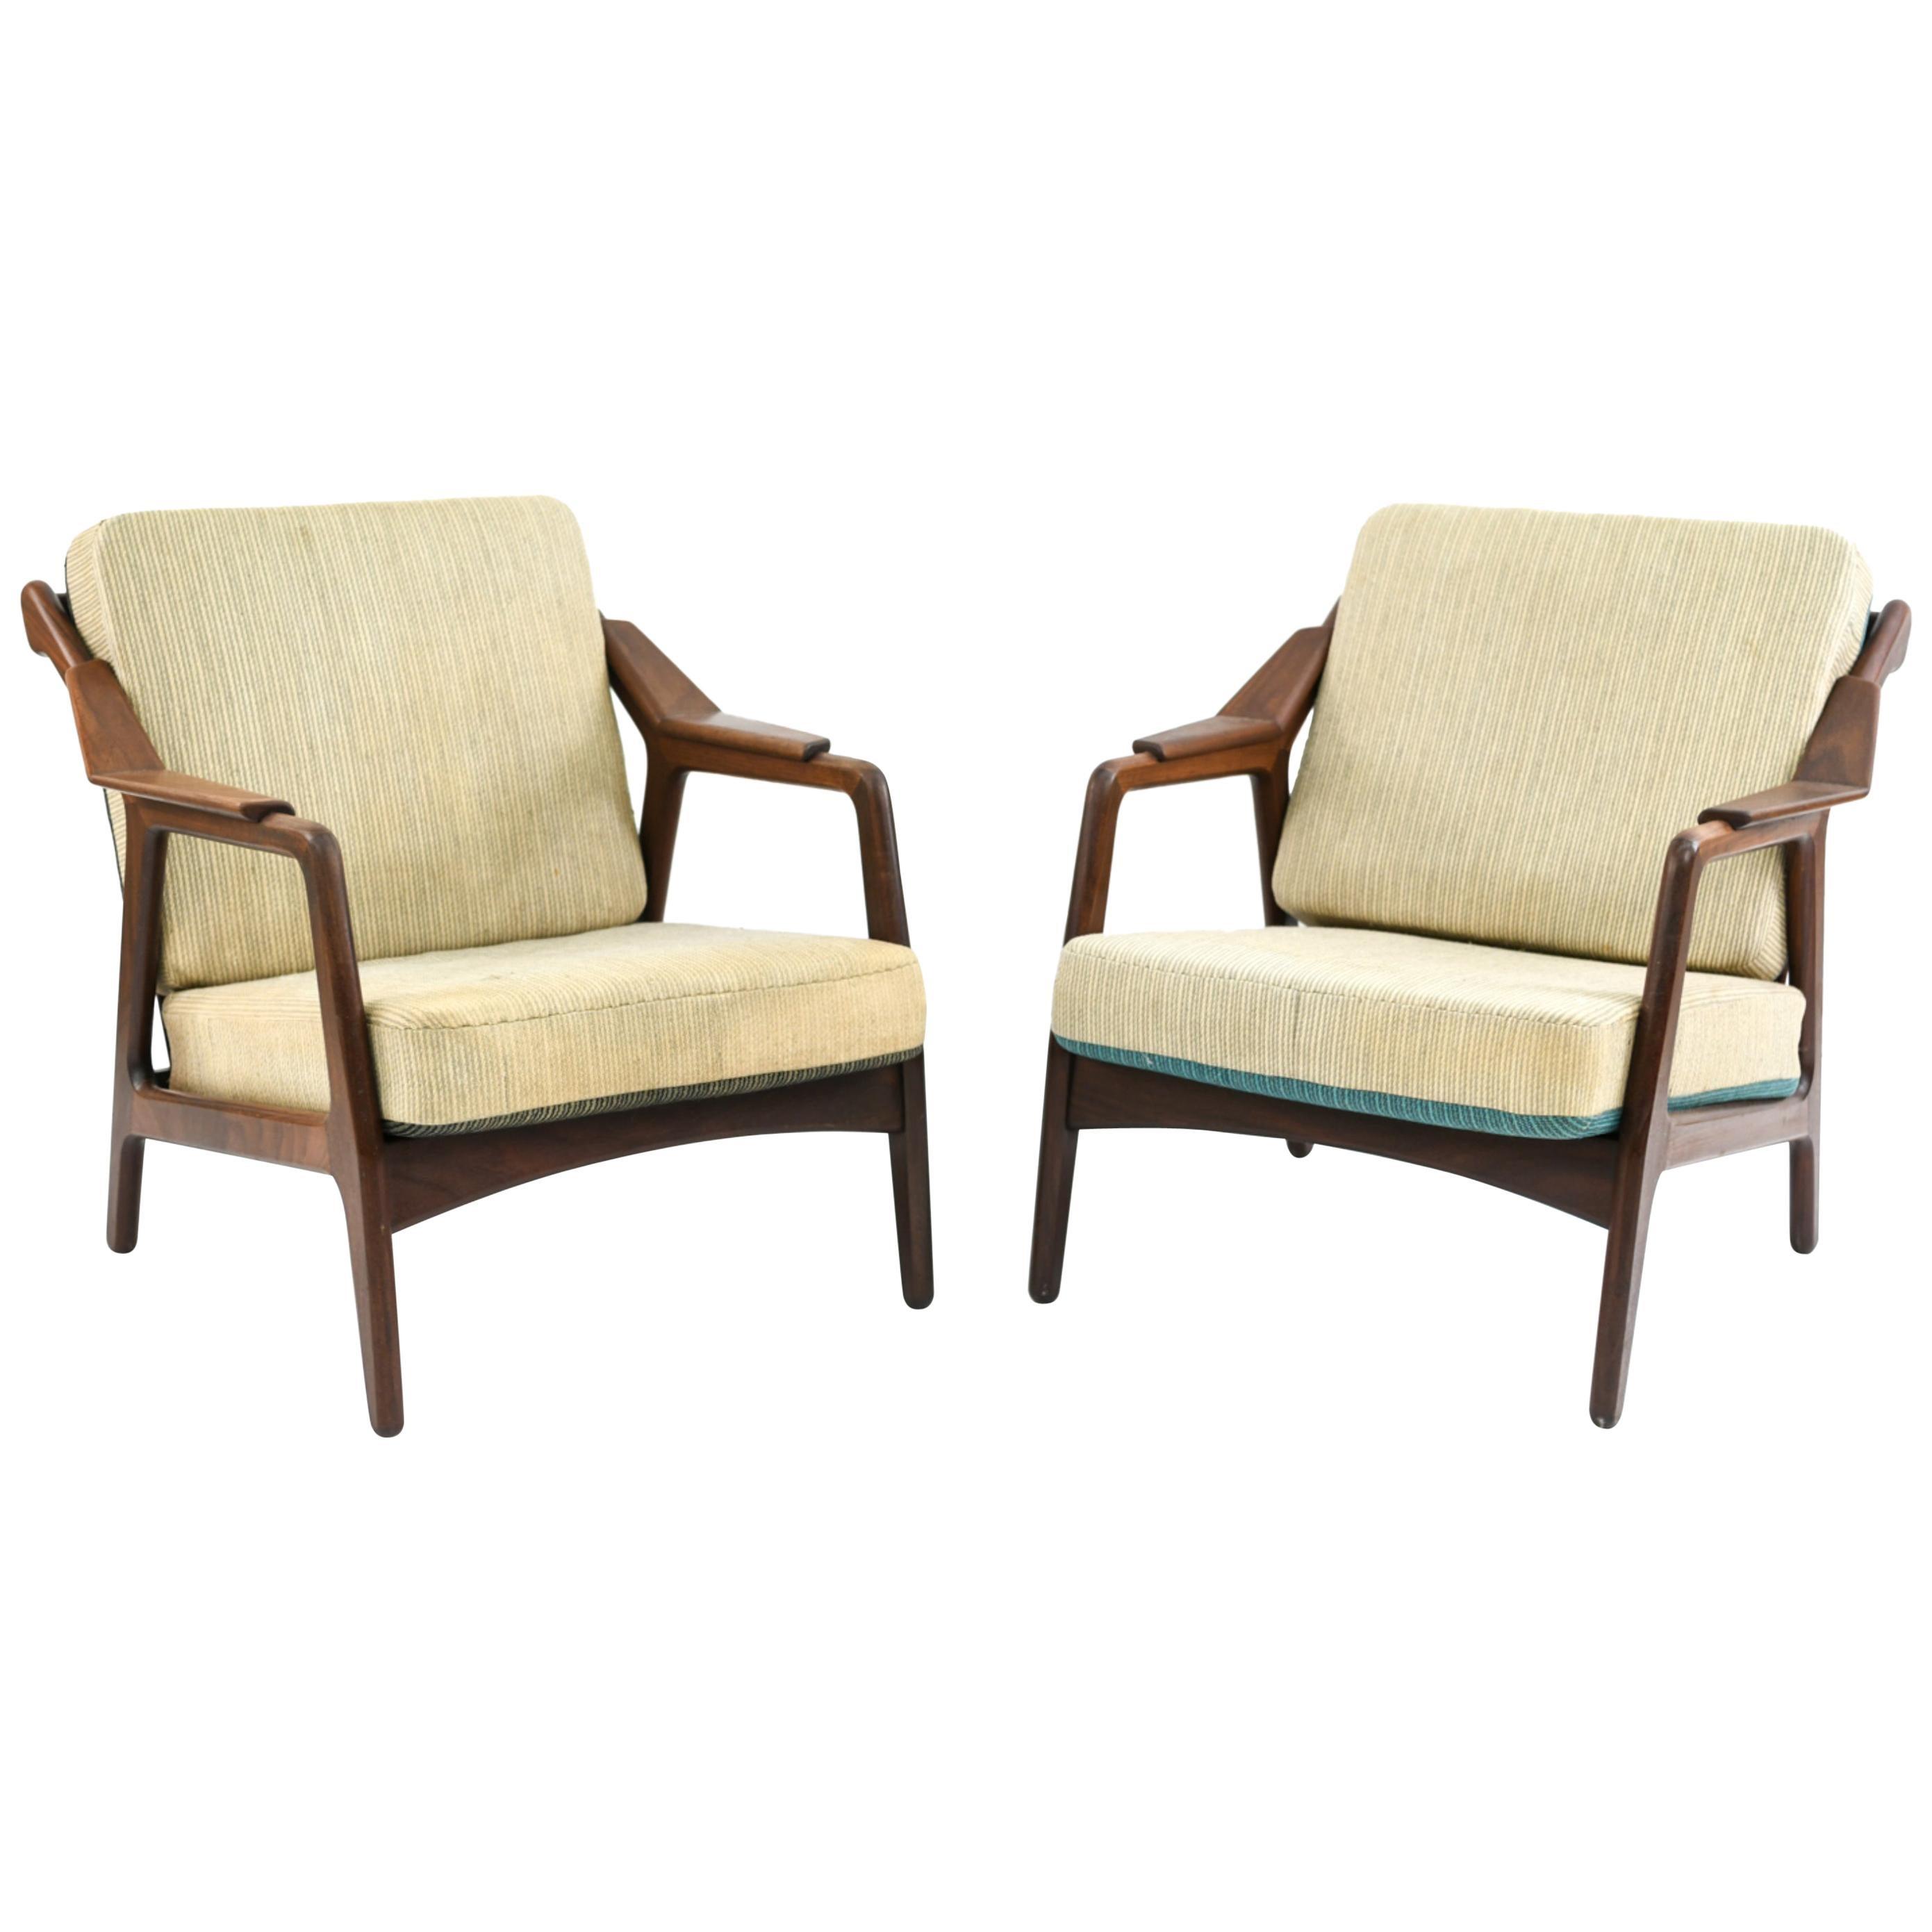 Pair of H. Brockmann-Petersen Danish Lounge Chairs